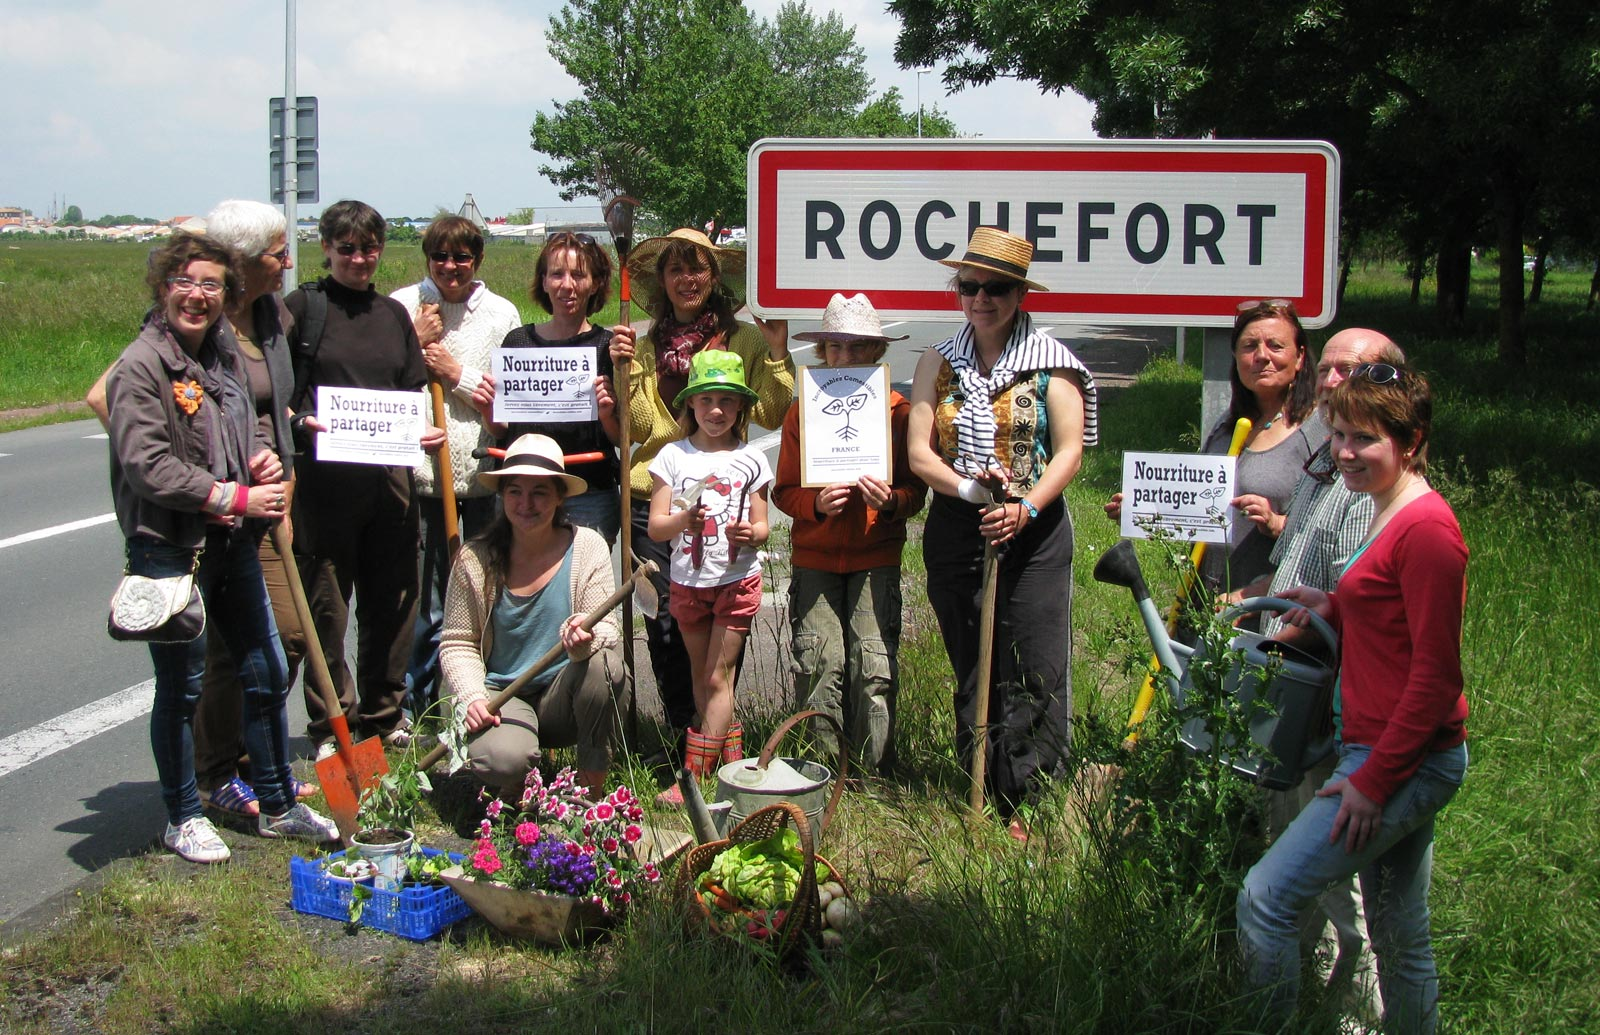 Rochefort_Incroyables-Comestibles_Incredible-Edible